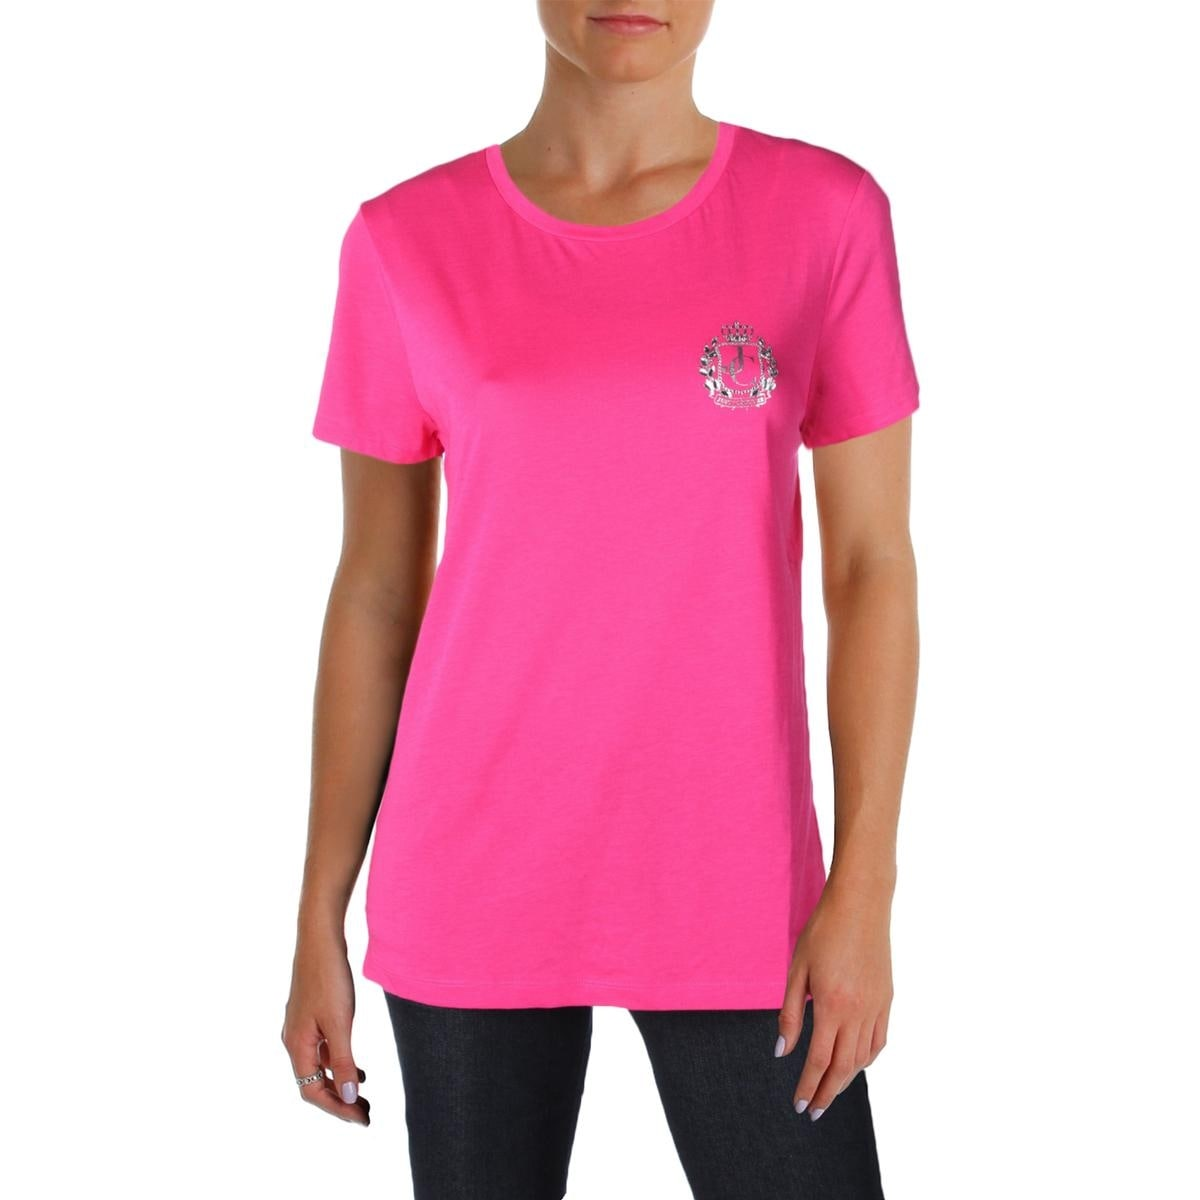 d4b836b85bb0 Shop Juicy Couture Black Label Womens T-Shirt Crewneck Logo - Free ...